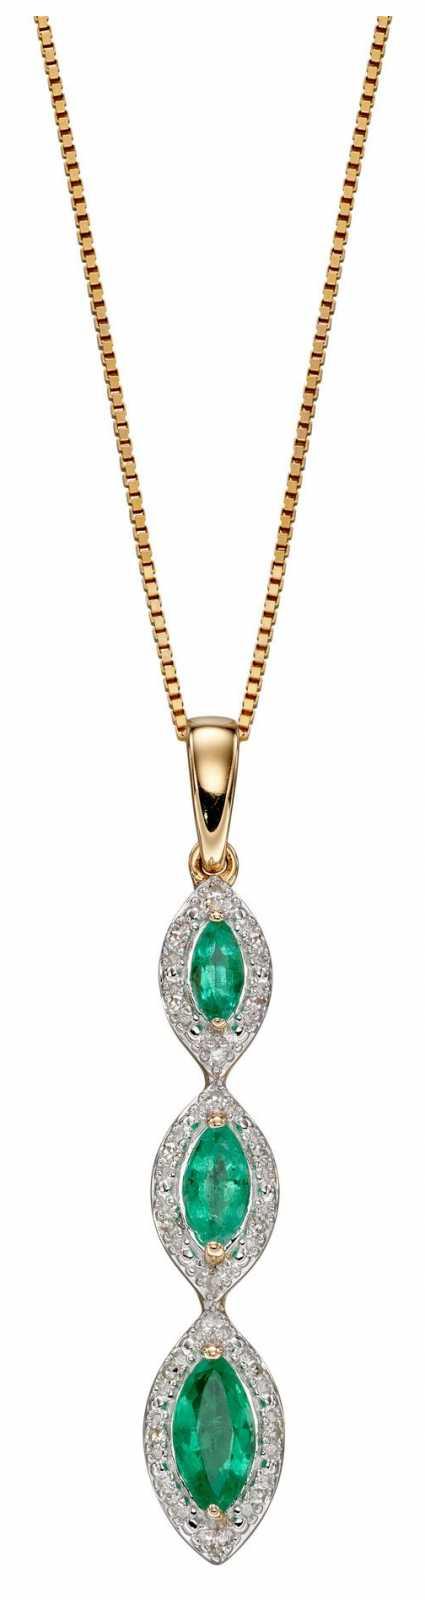 Elements Gold 9ct Yellow Gold Diamond emerald Oval 3 Drop Pendant GP2240G